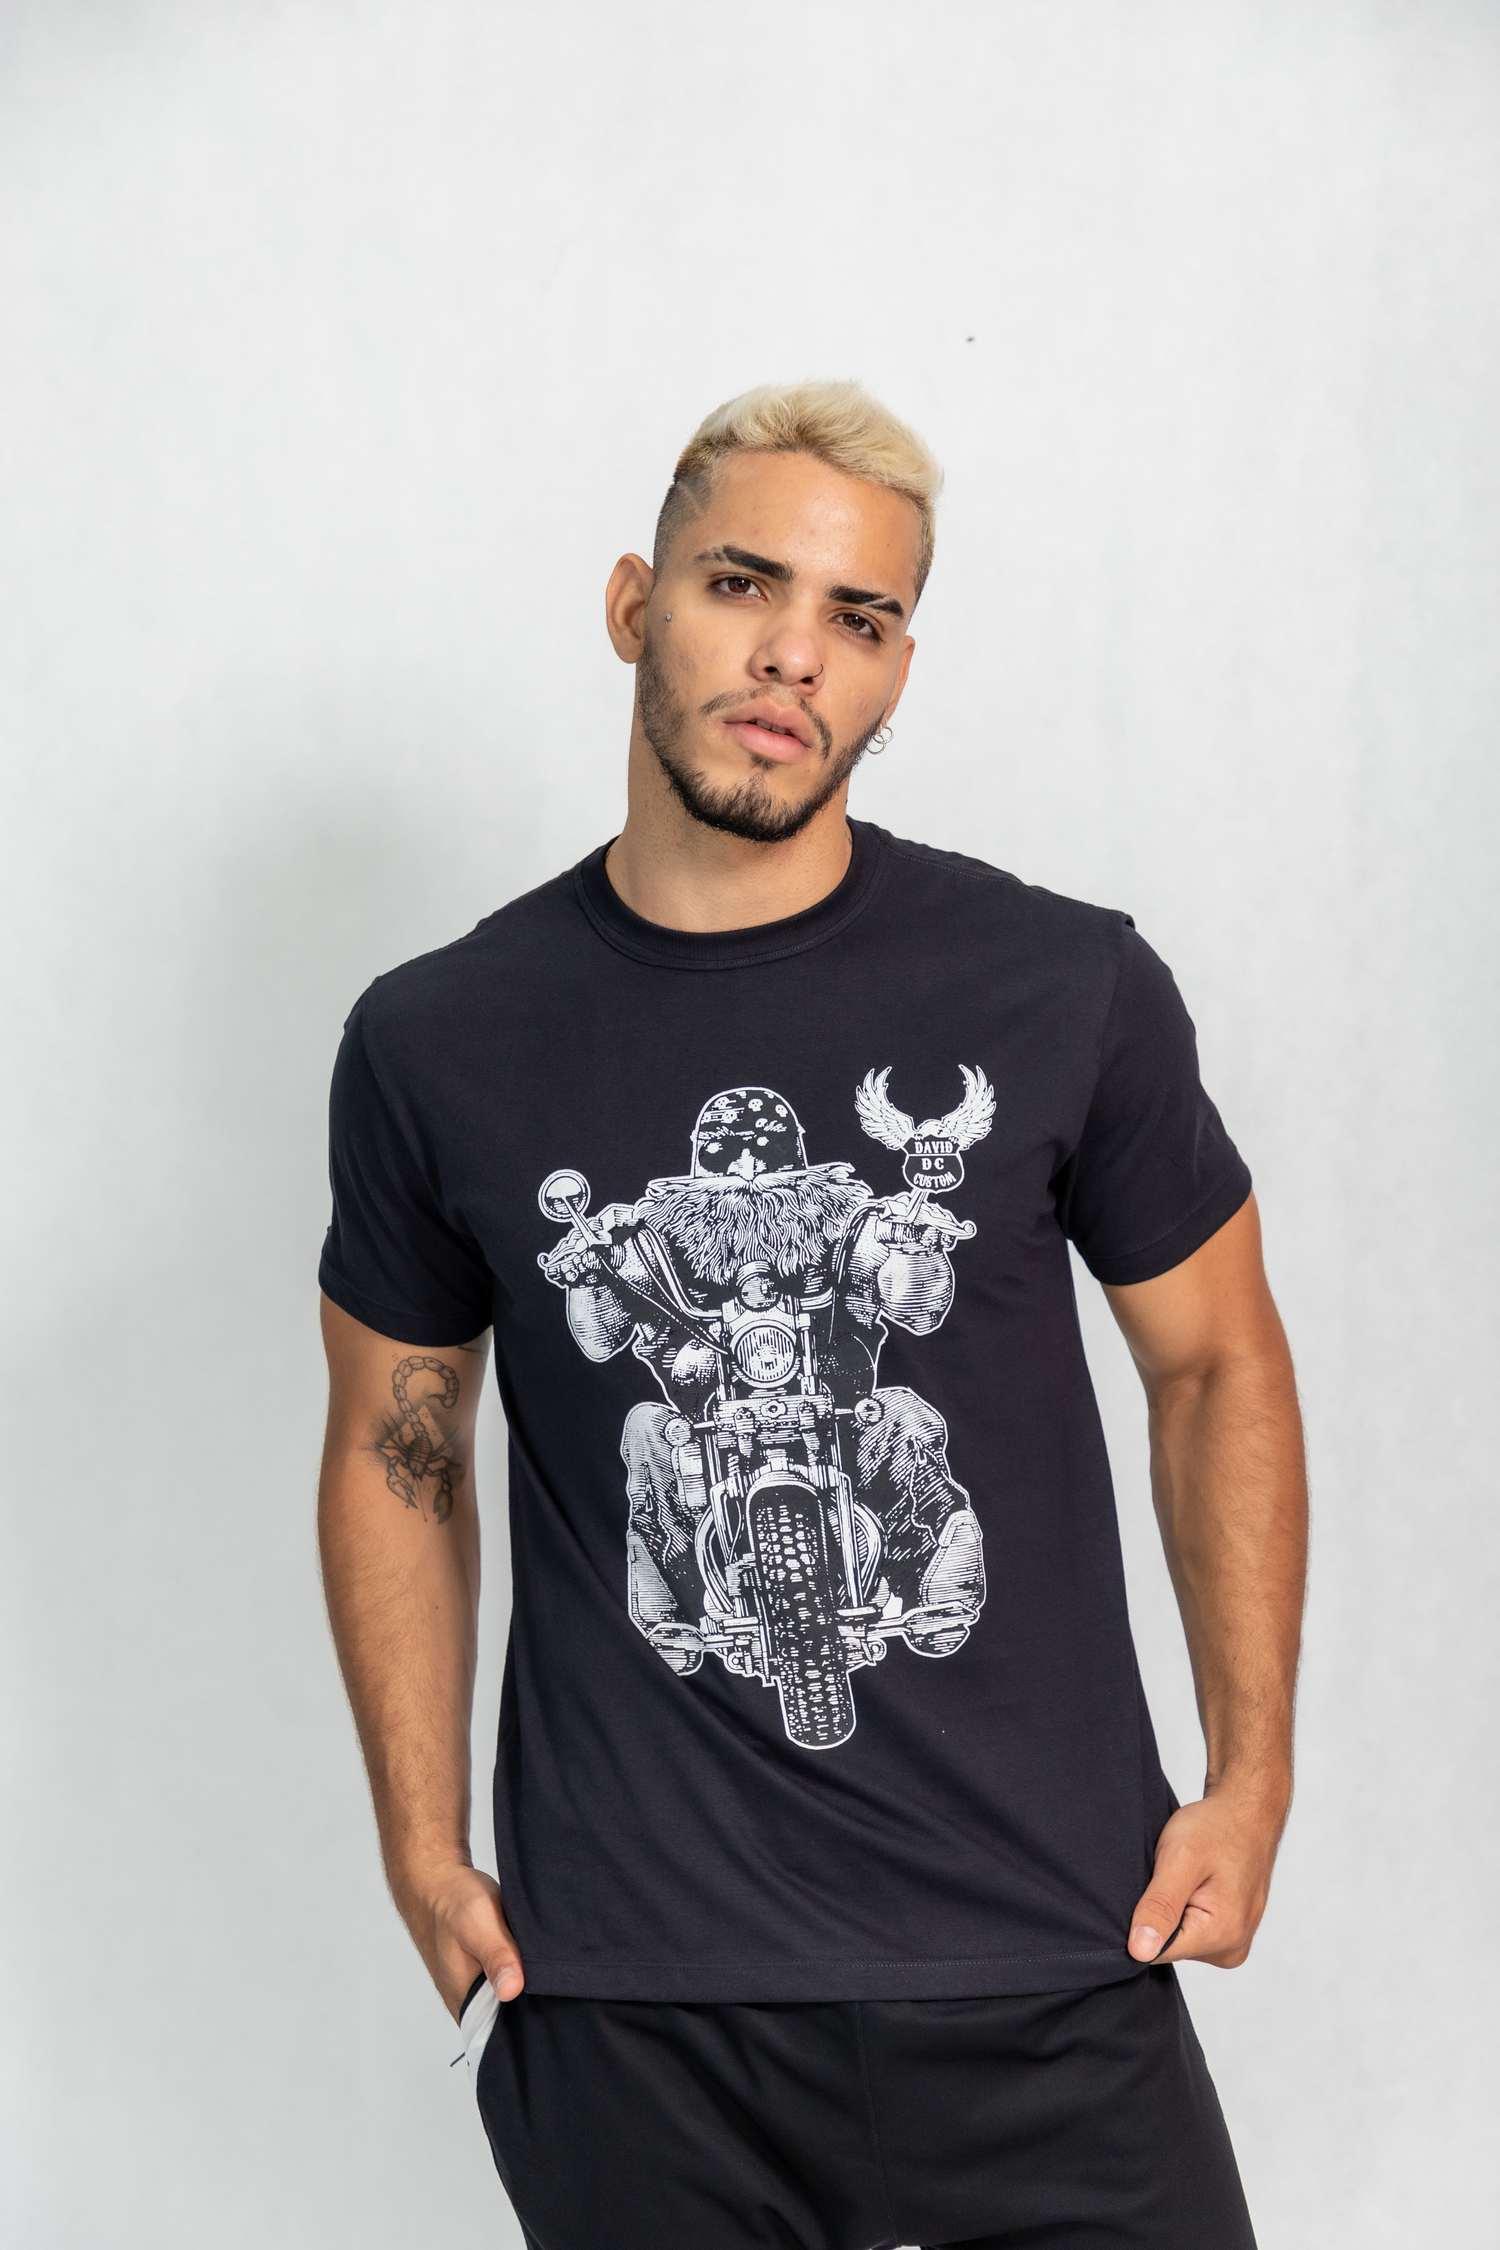 Camiseta masculina estampa Motociclista de Bandana